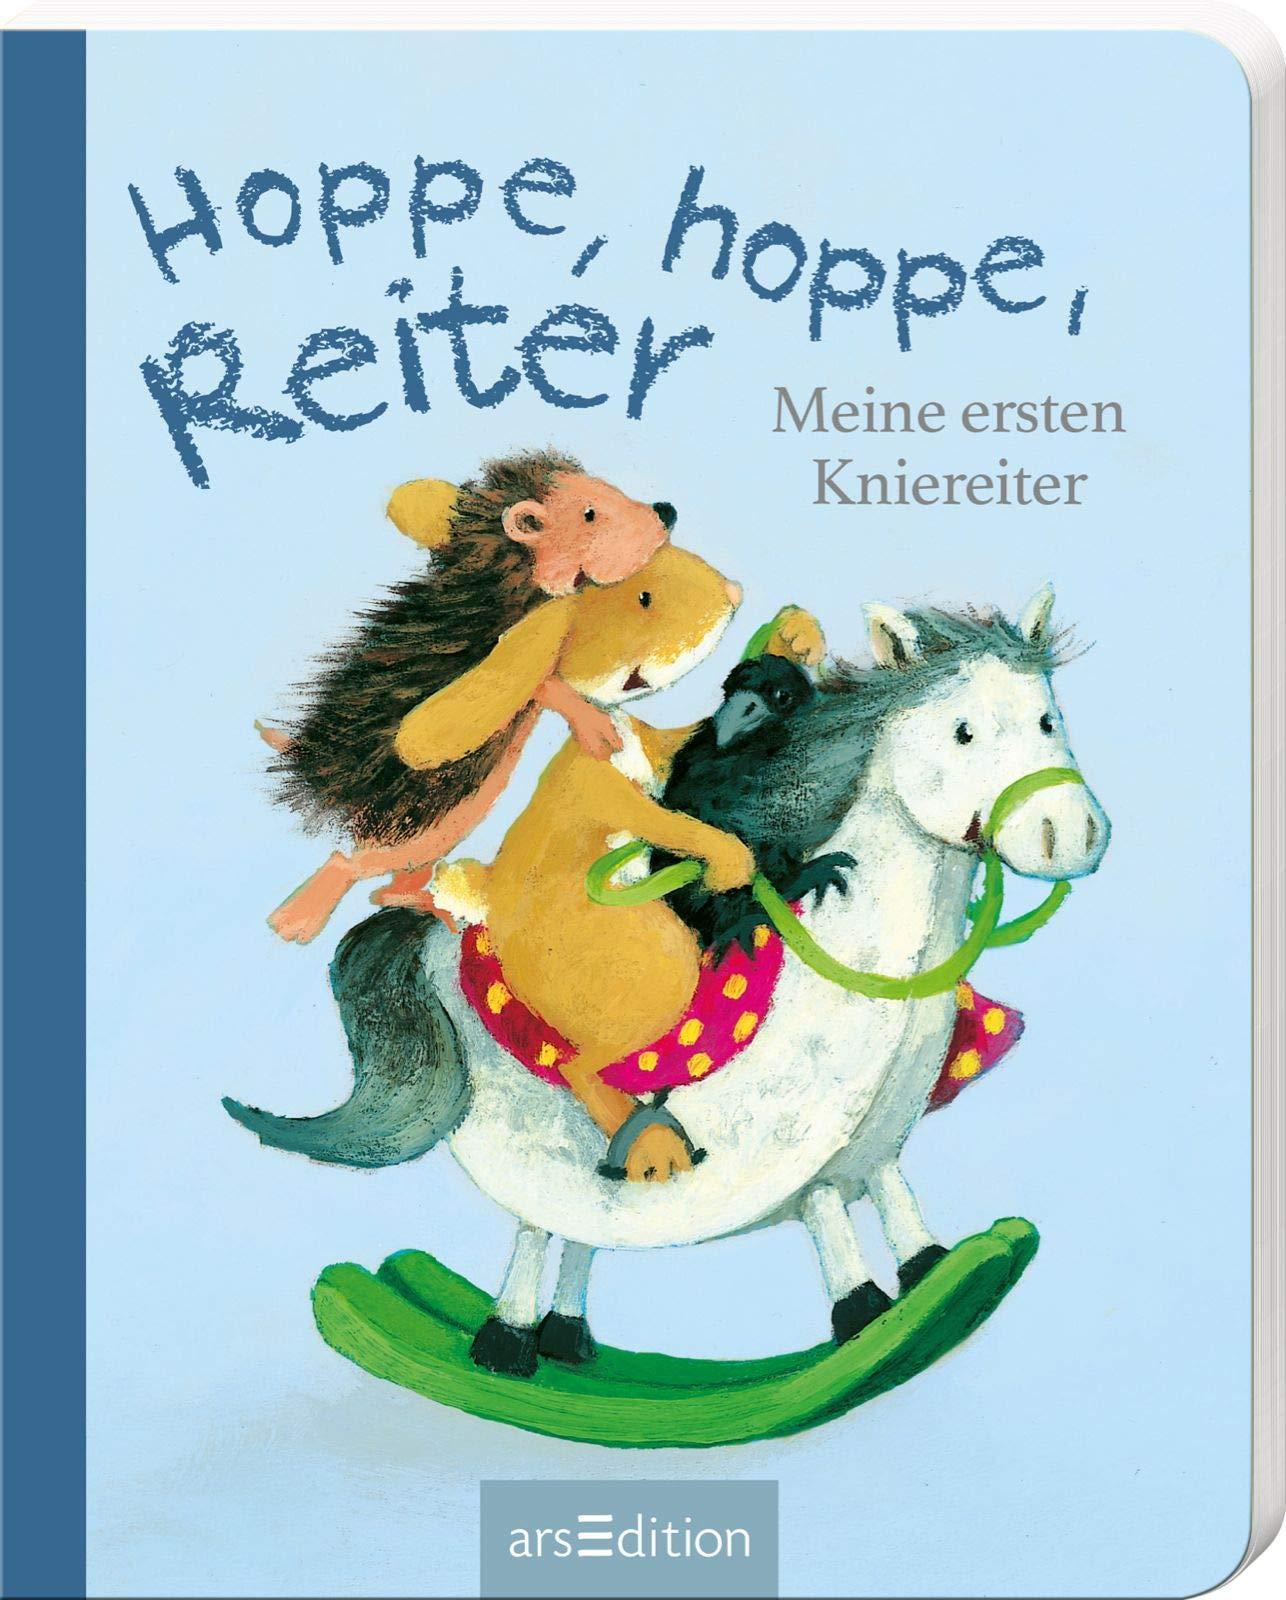 Reiter Erste Kniereiter hoppe Hoppe